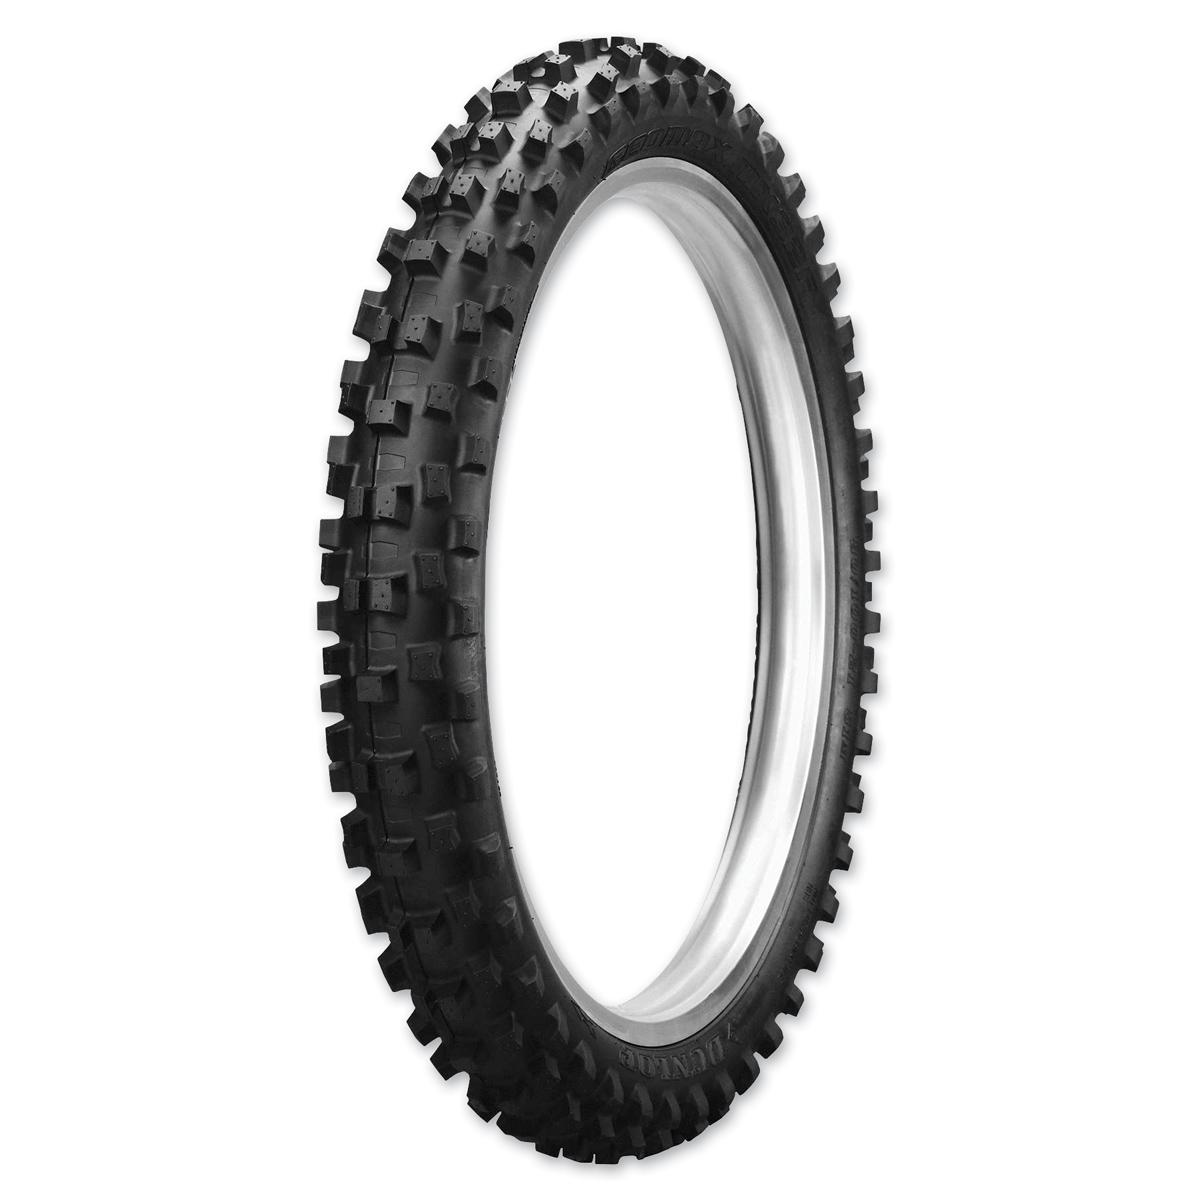 Dunlop MX3S/32 60/100-14 S/T-I/T Front Tire